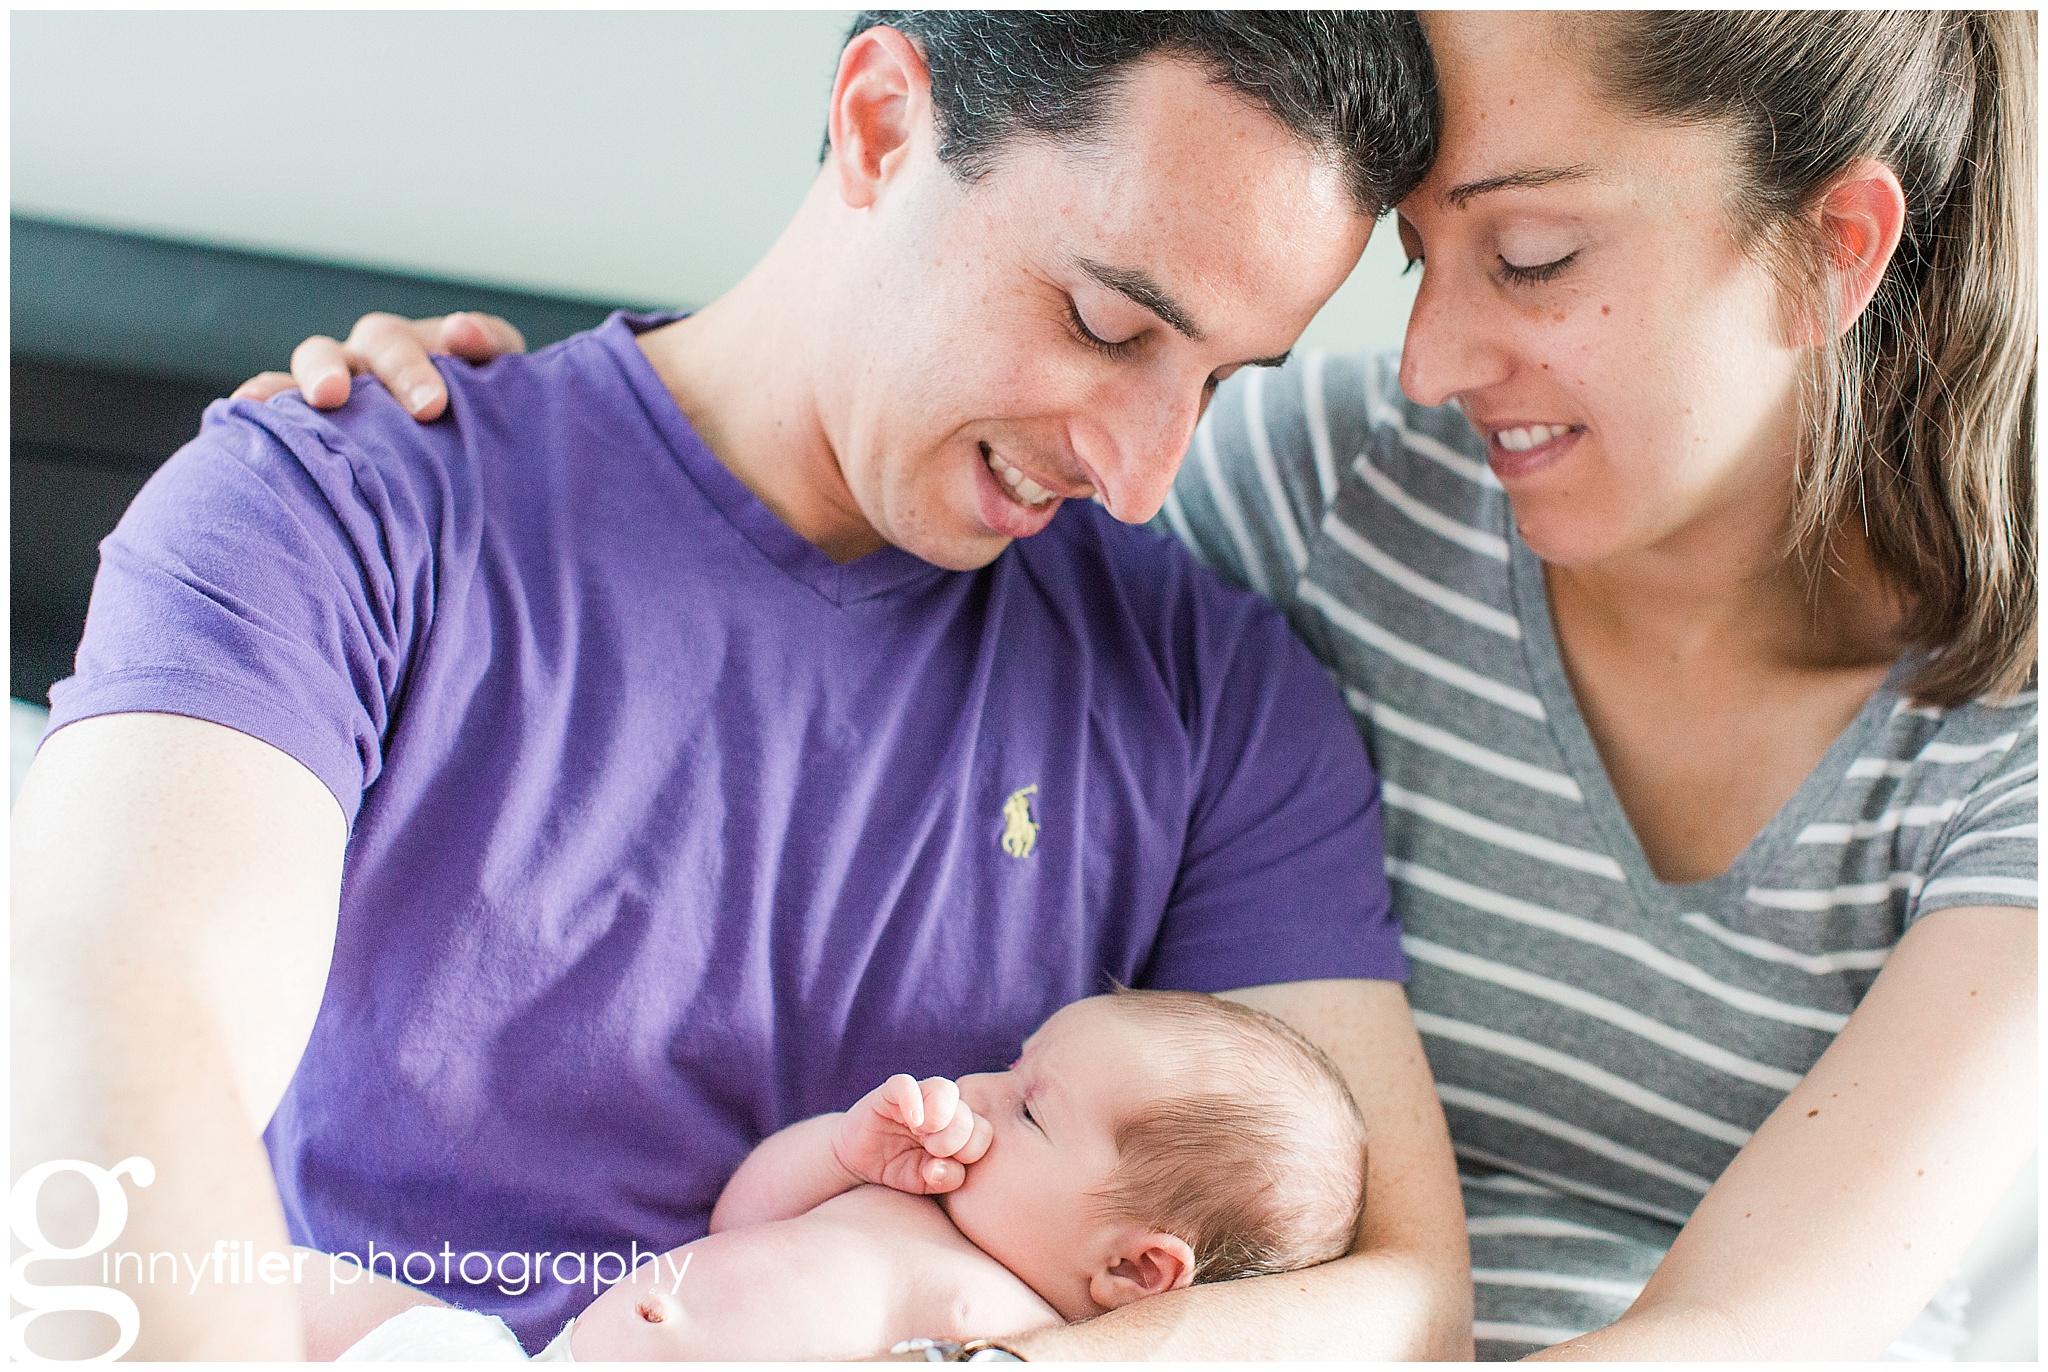 family_photography_newborn_0148.jpg